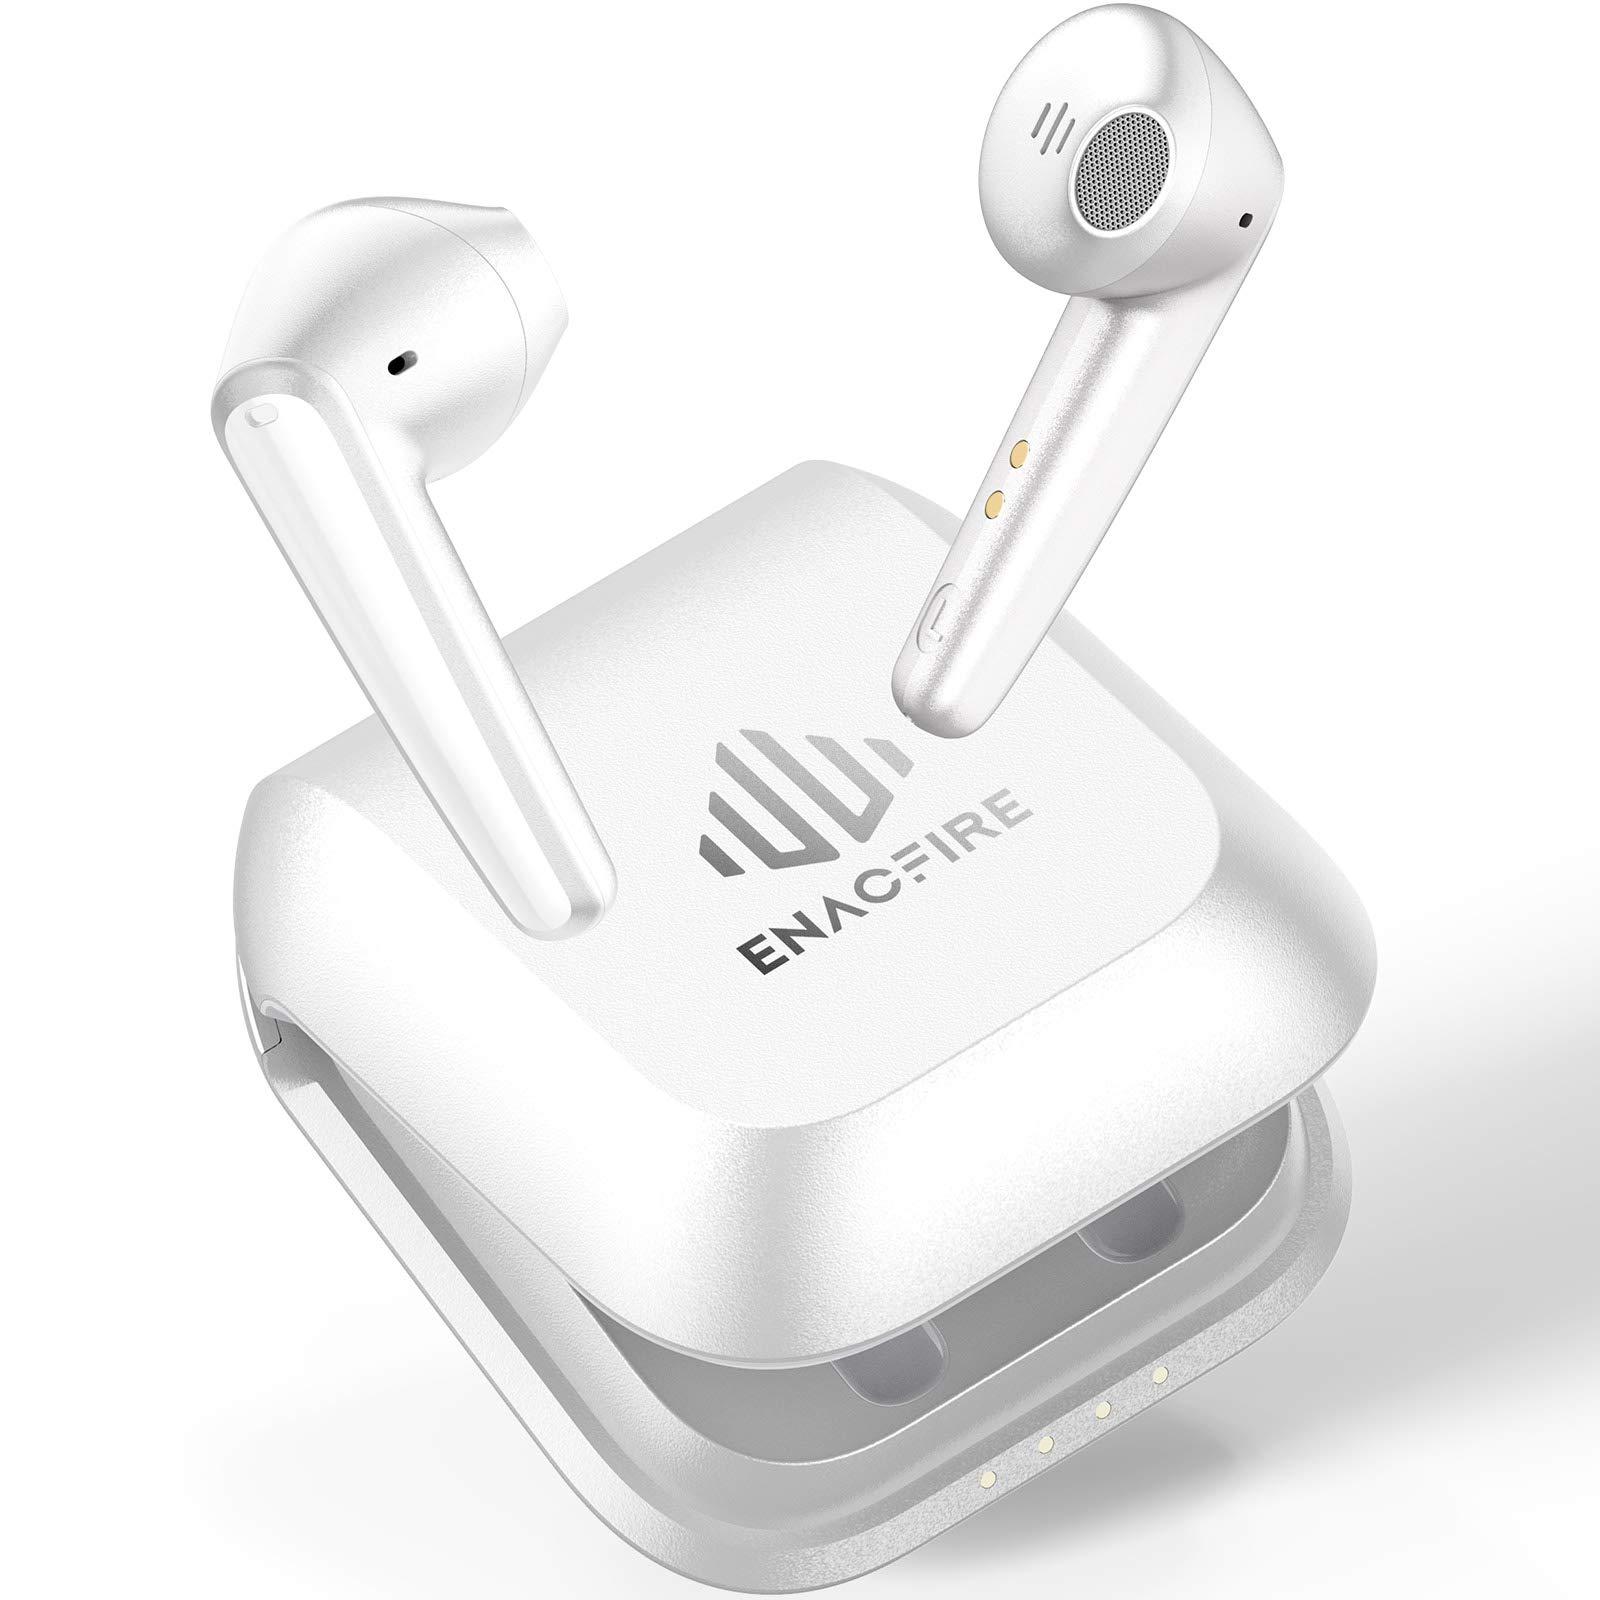 Auriculares Earbuds Inalambricos ENACFIRE Waterproof IPX8